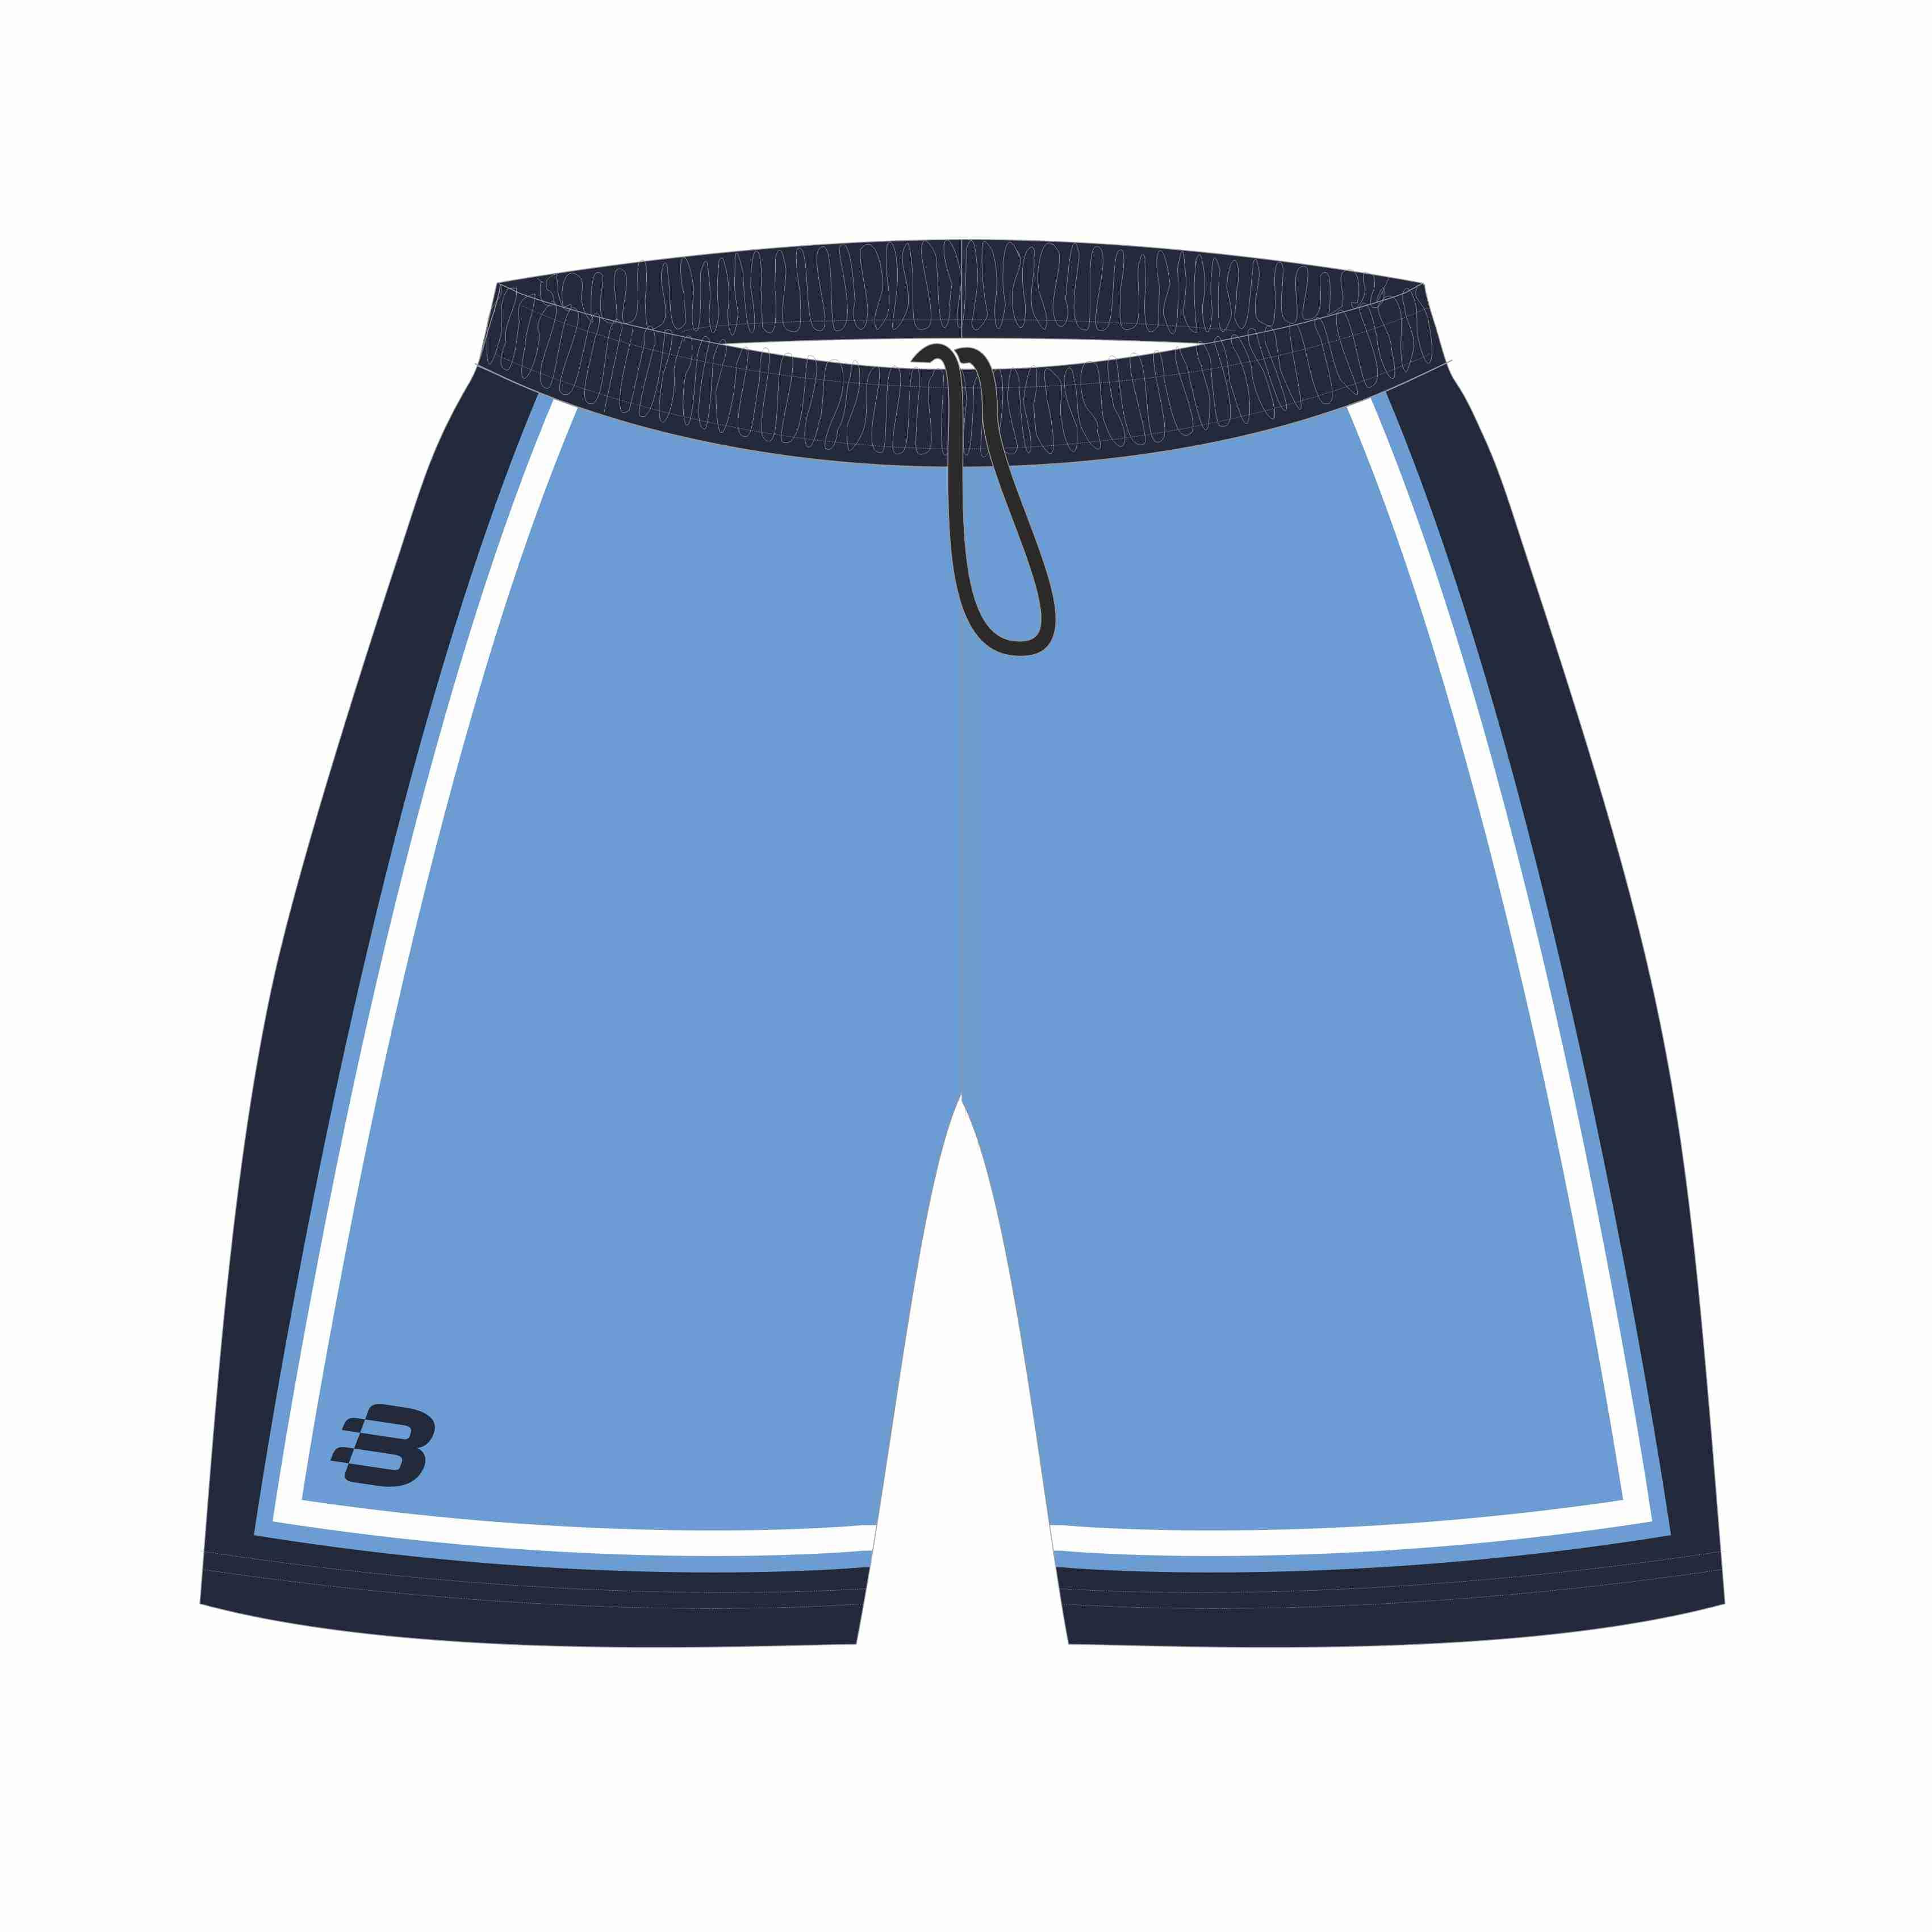 Sturt Sabres - Mens Basketball Shorts